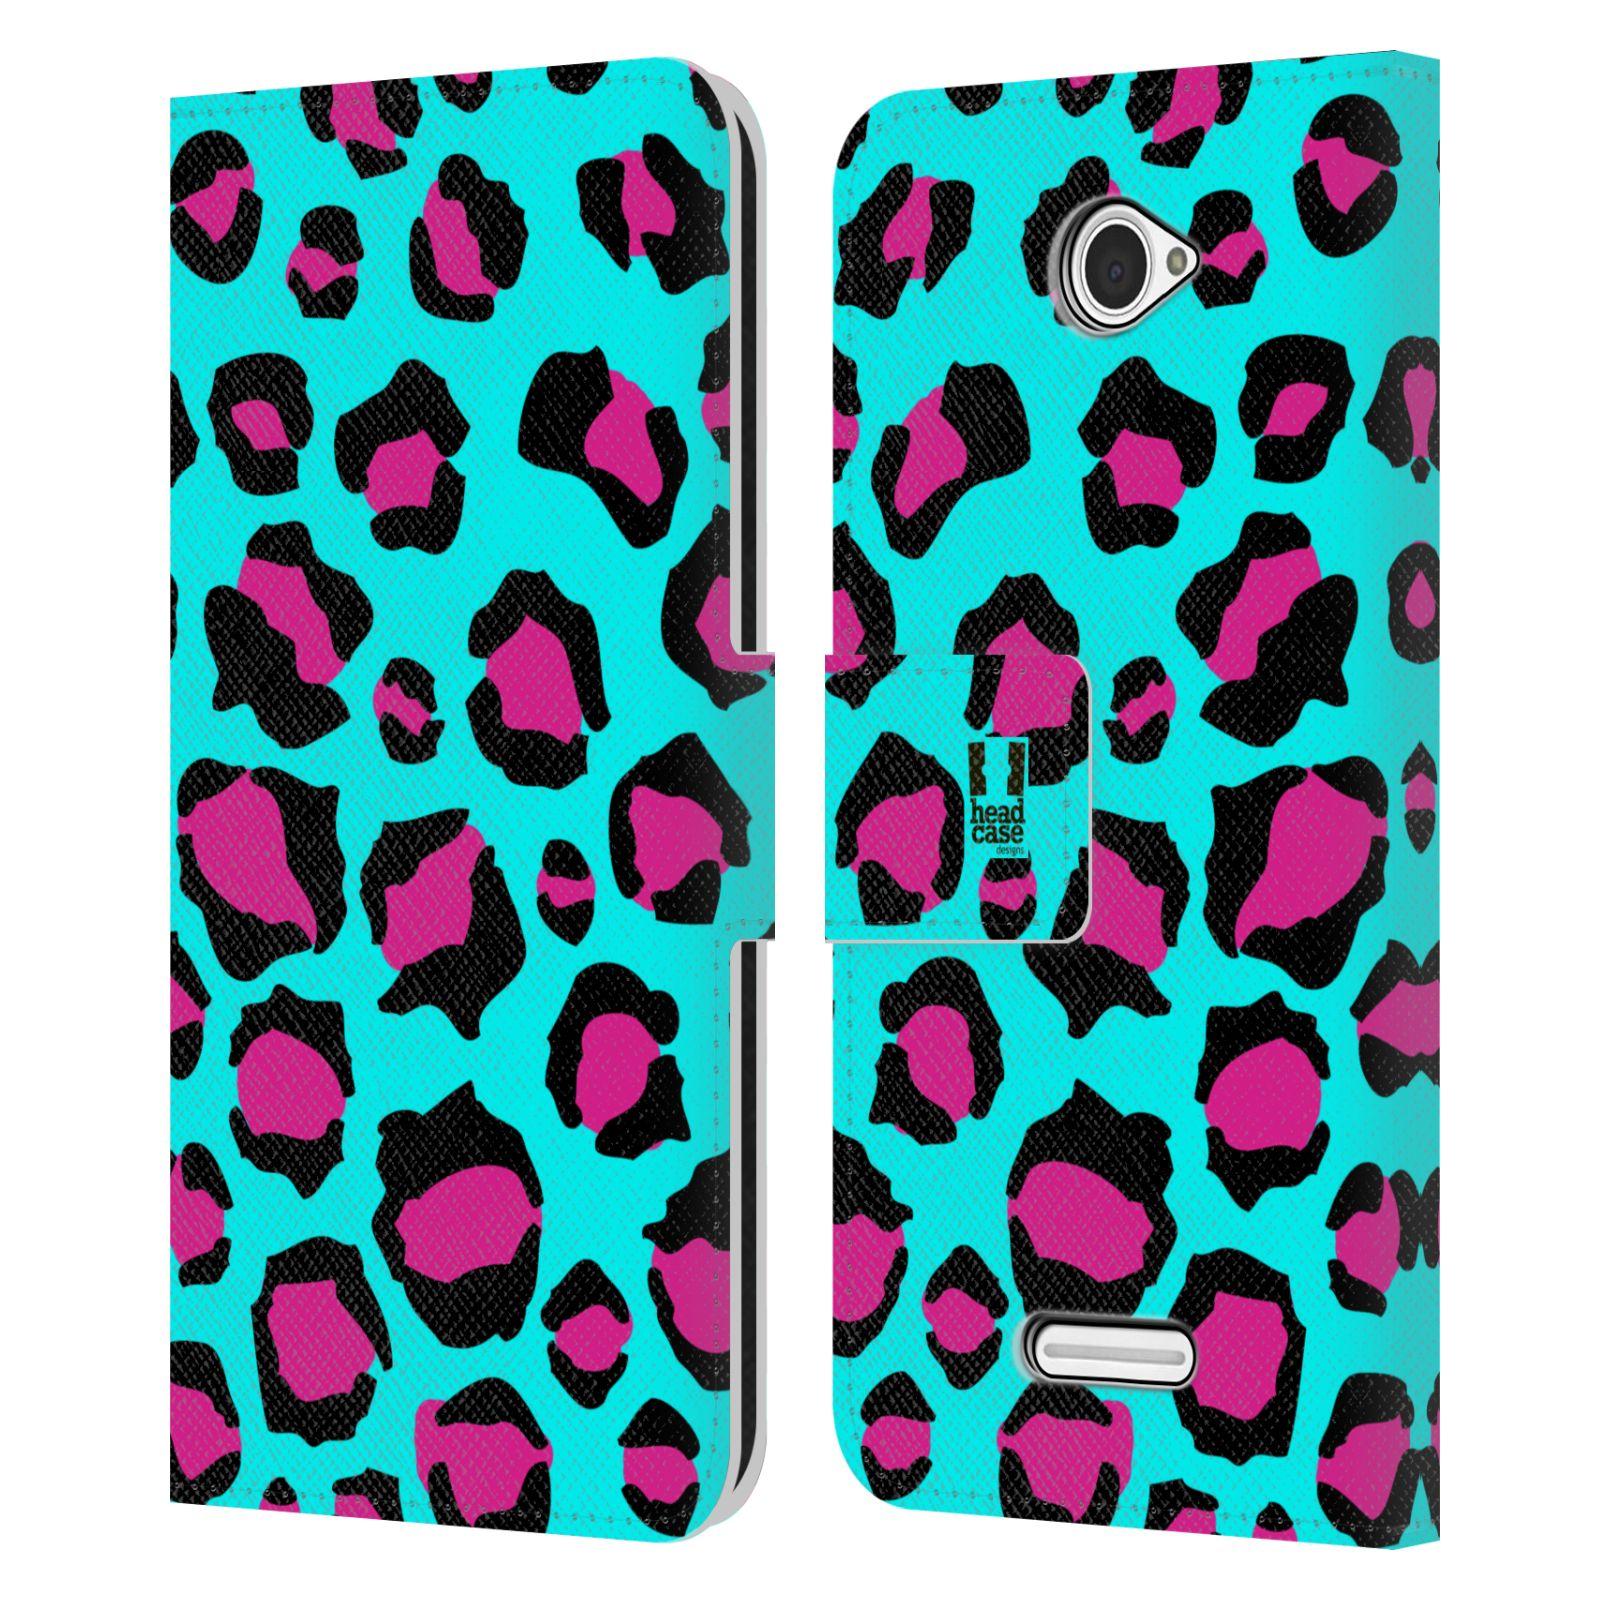 HEAD CASE Flipové pouzdro pro mobil SONY XPERIA E4 Zvířecí barevné vzory tyrkysový leopard